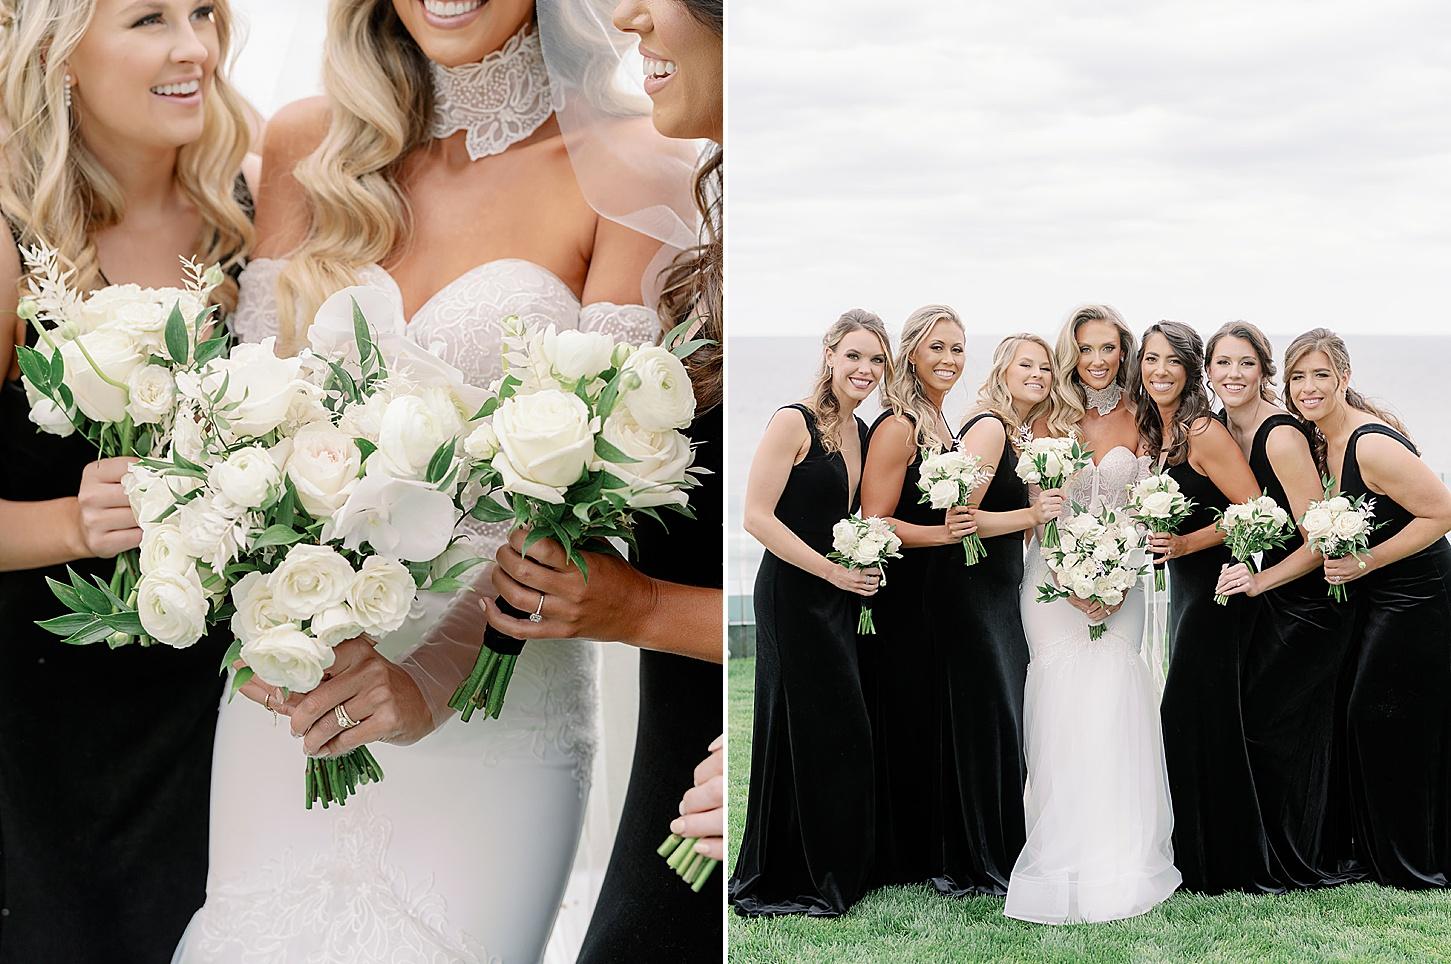 Atlantic City Wedding Photography Studio by Magdalena Studios Lexy Cha 0035